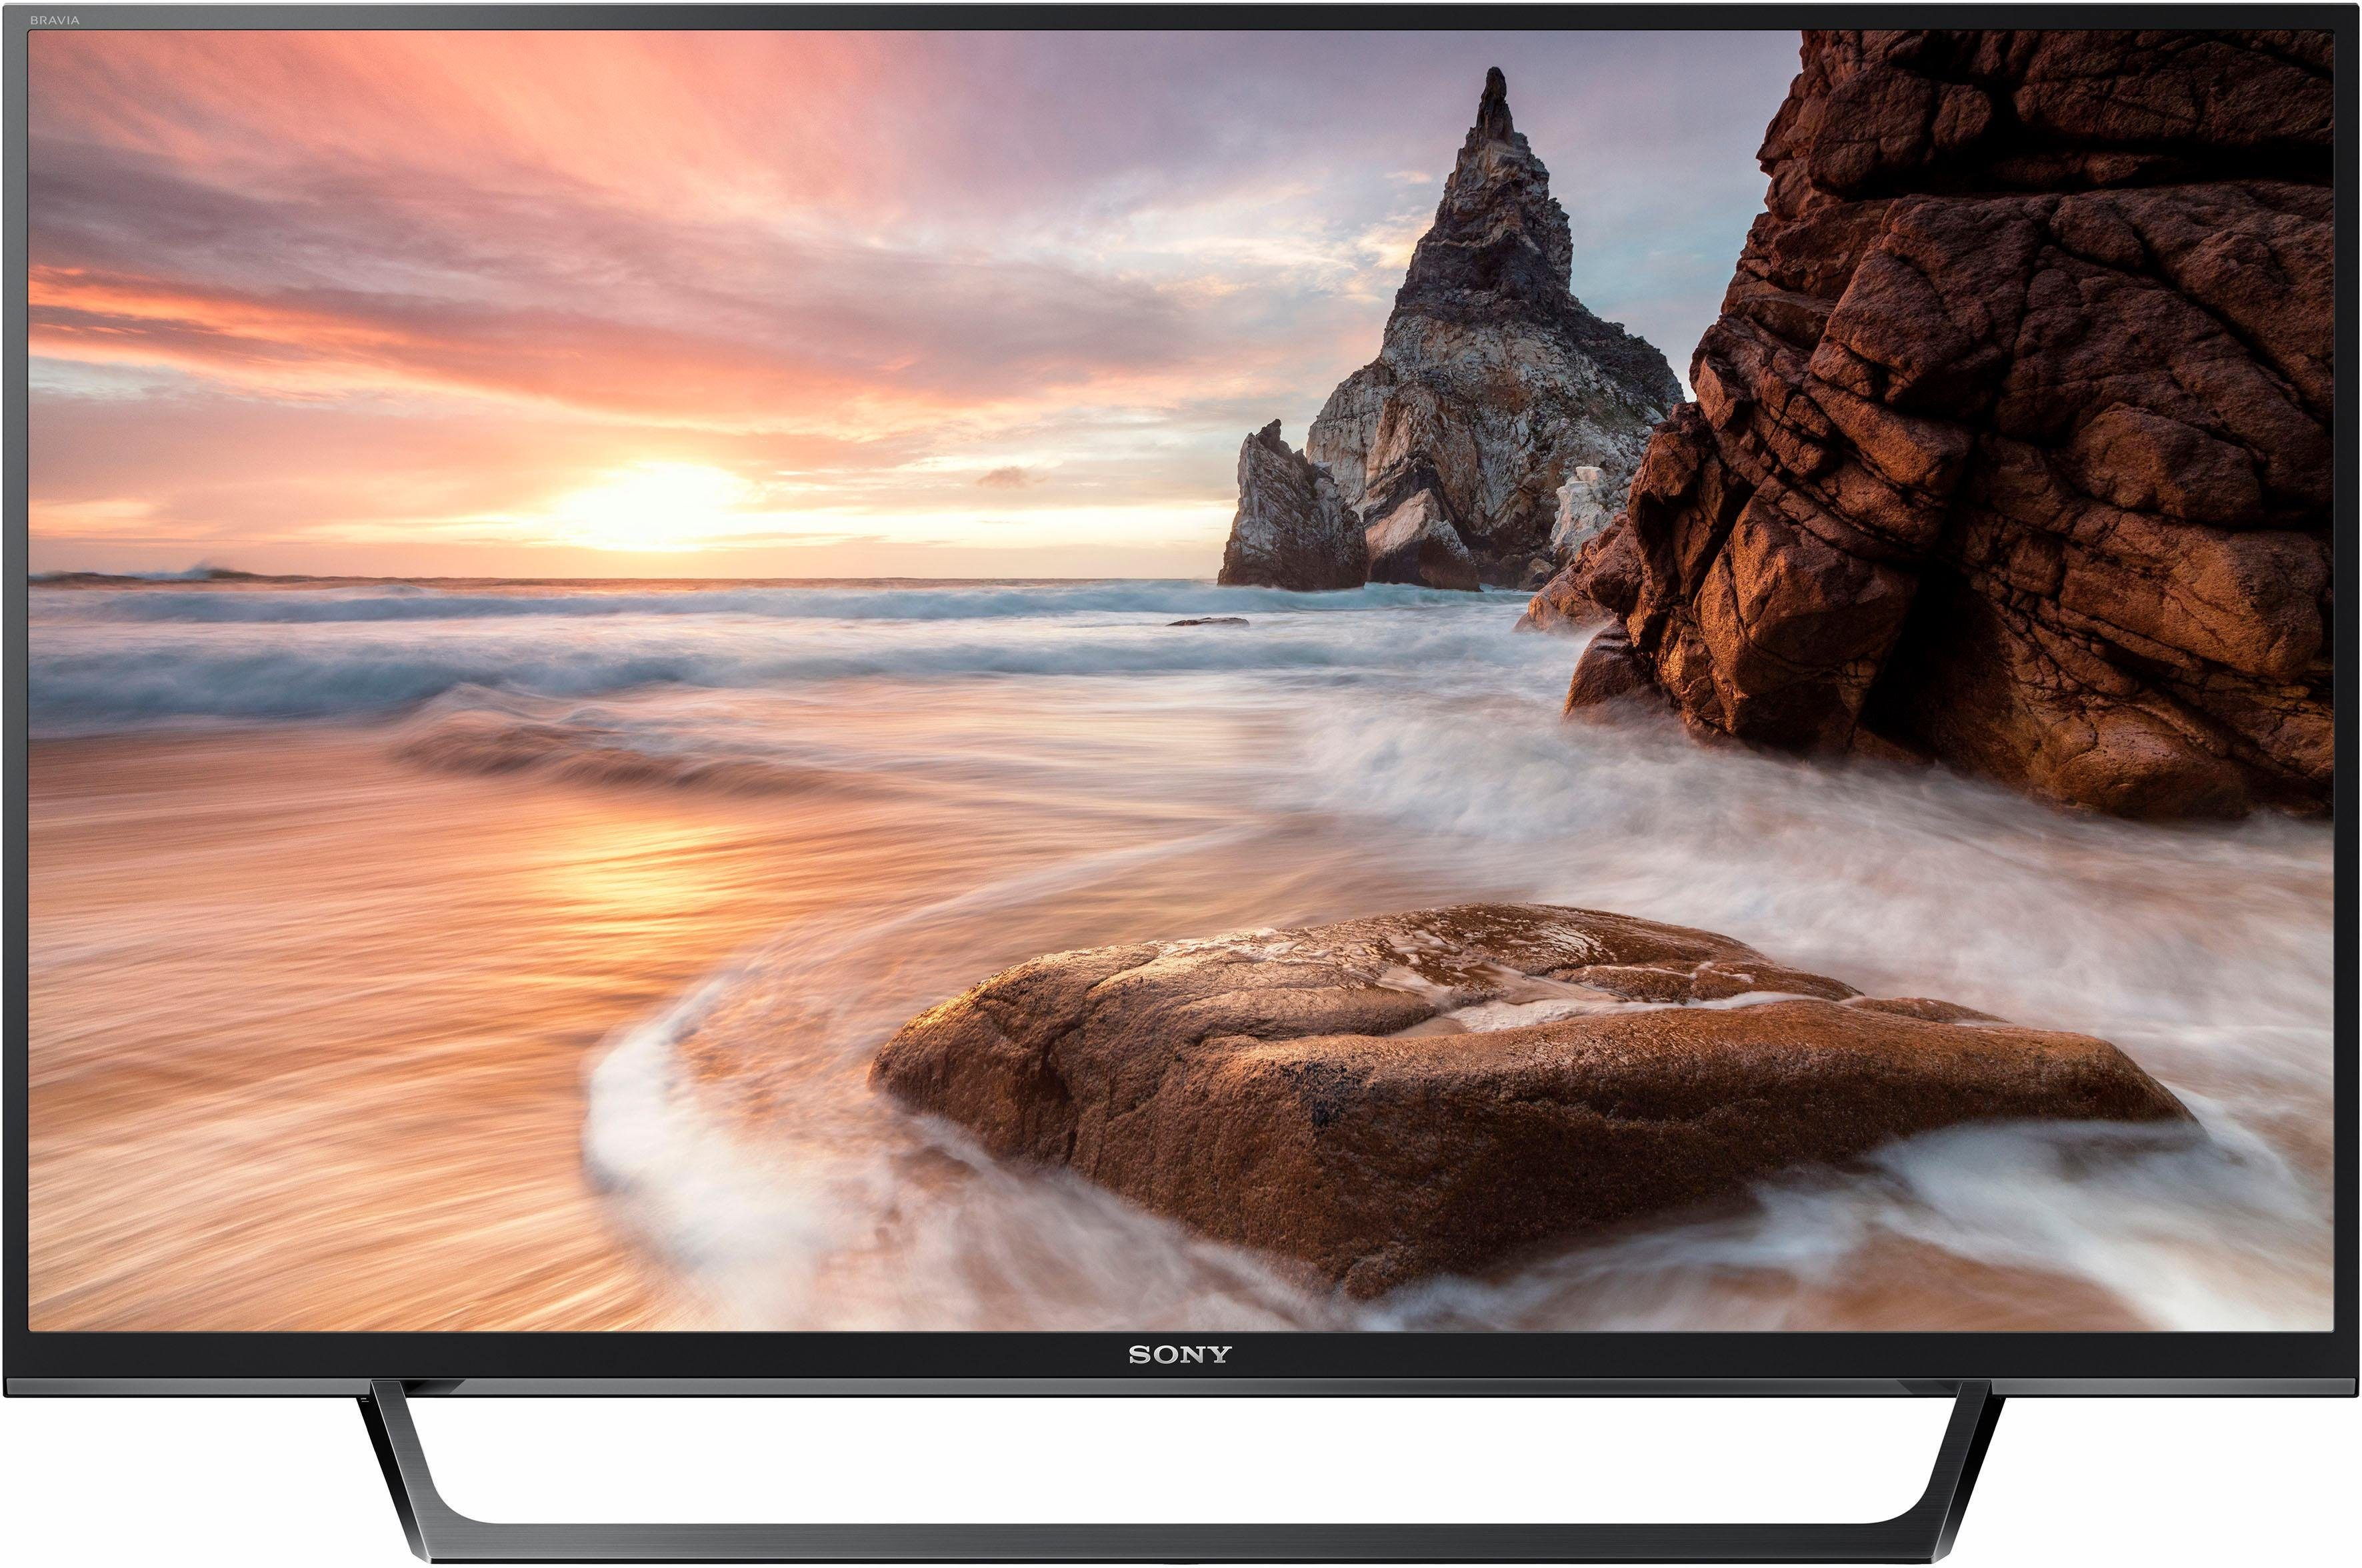 Sony KDL40RE455 LED-Fernseher (101 cm/40 Zoll, Full HD)